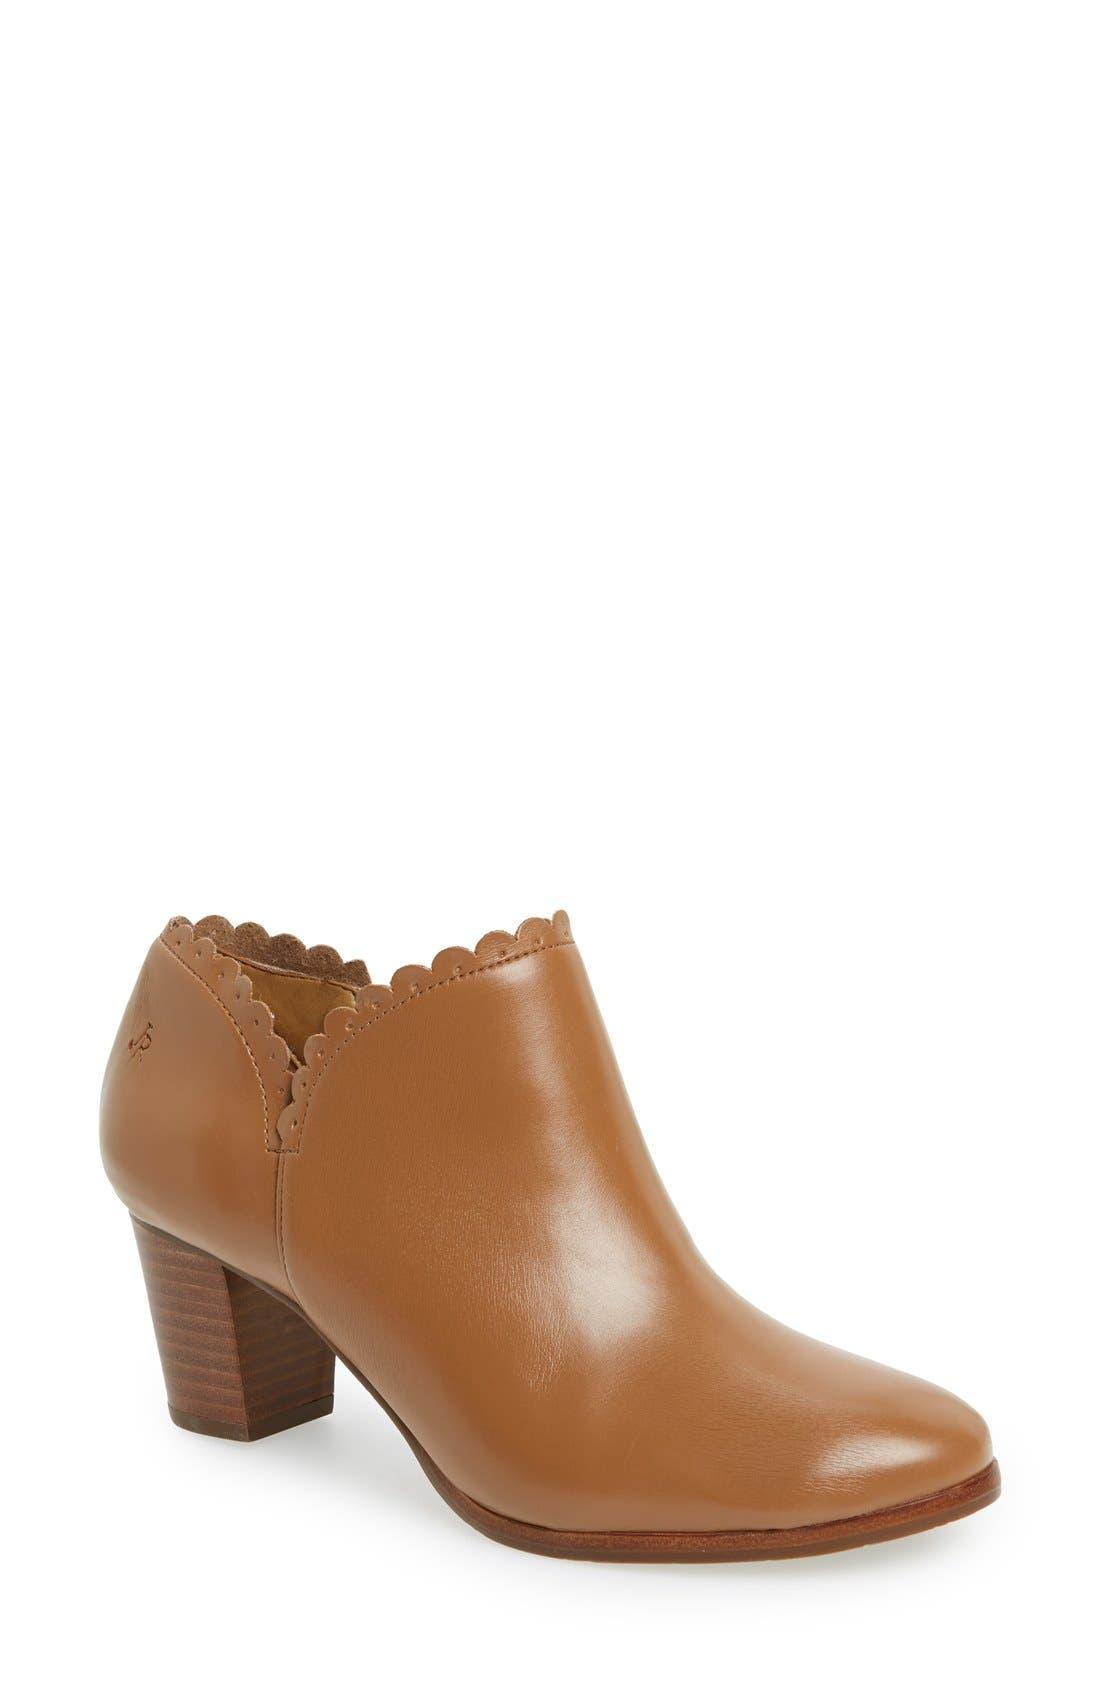 'Marianne' Bootie,                         Main,                         color, Cognac Leather